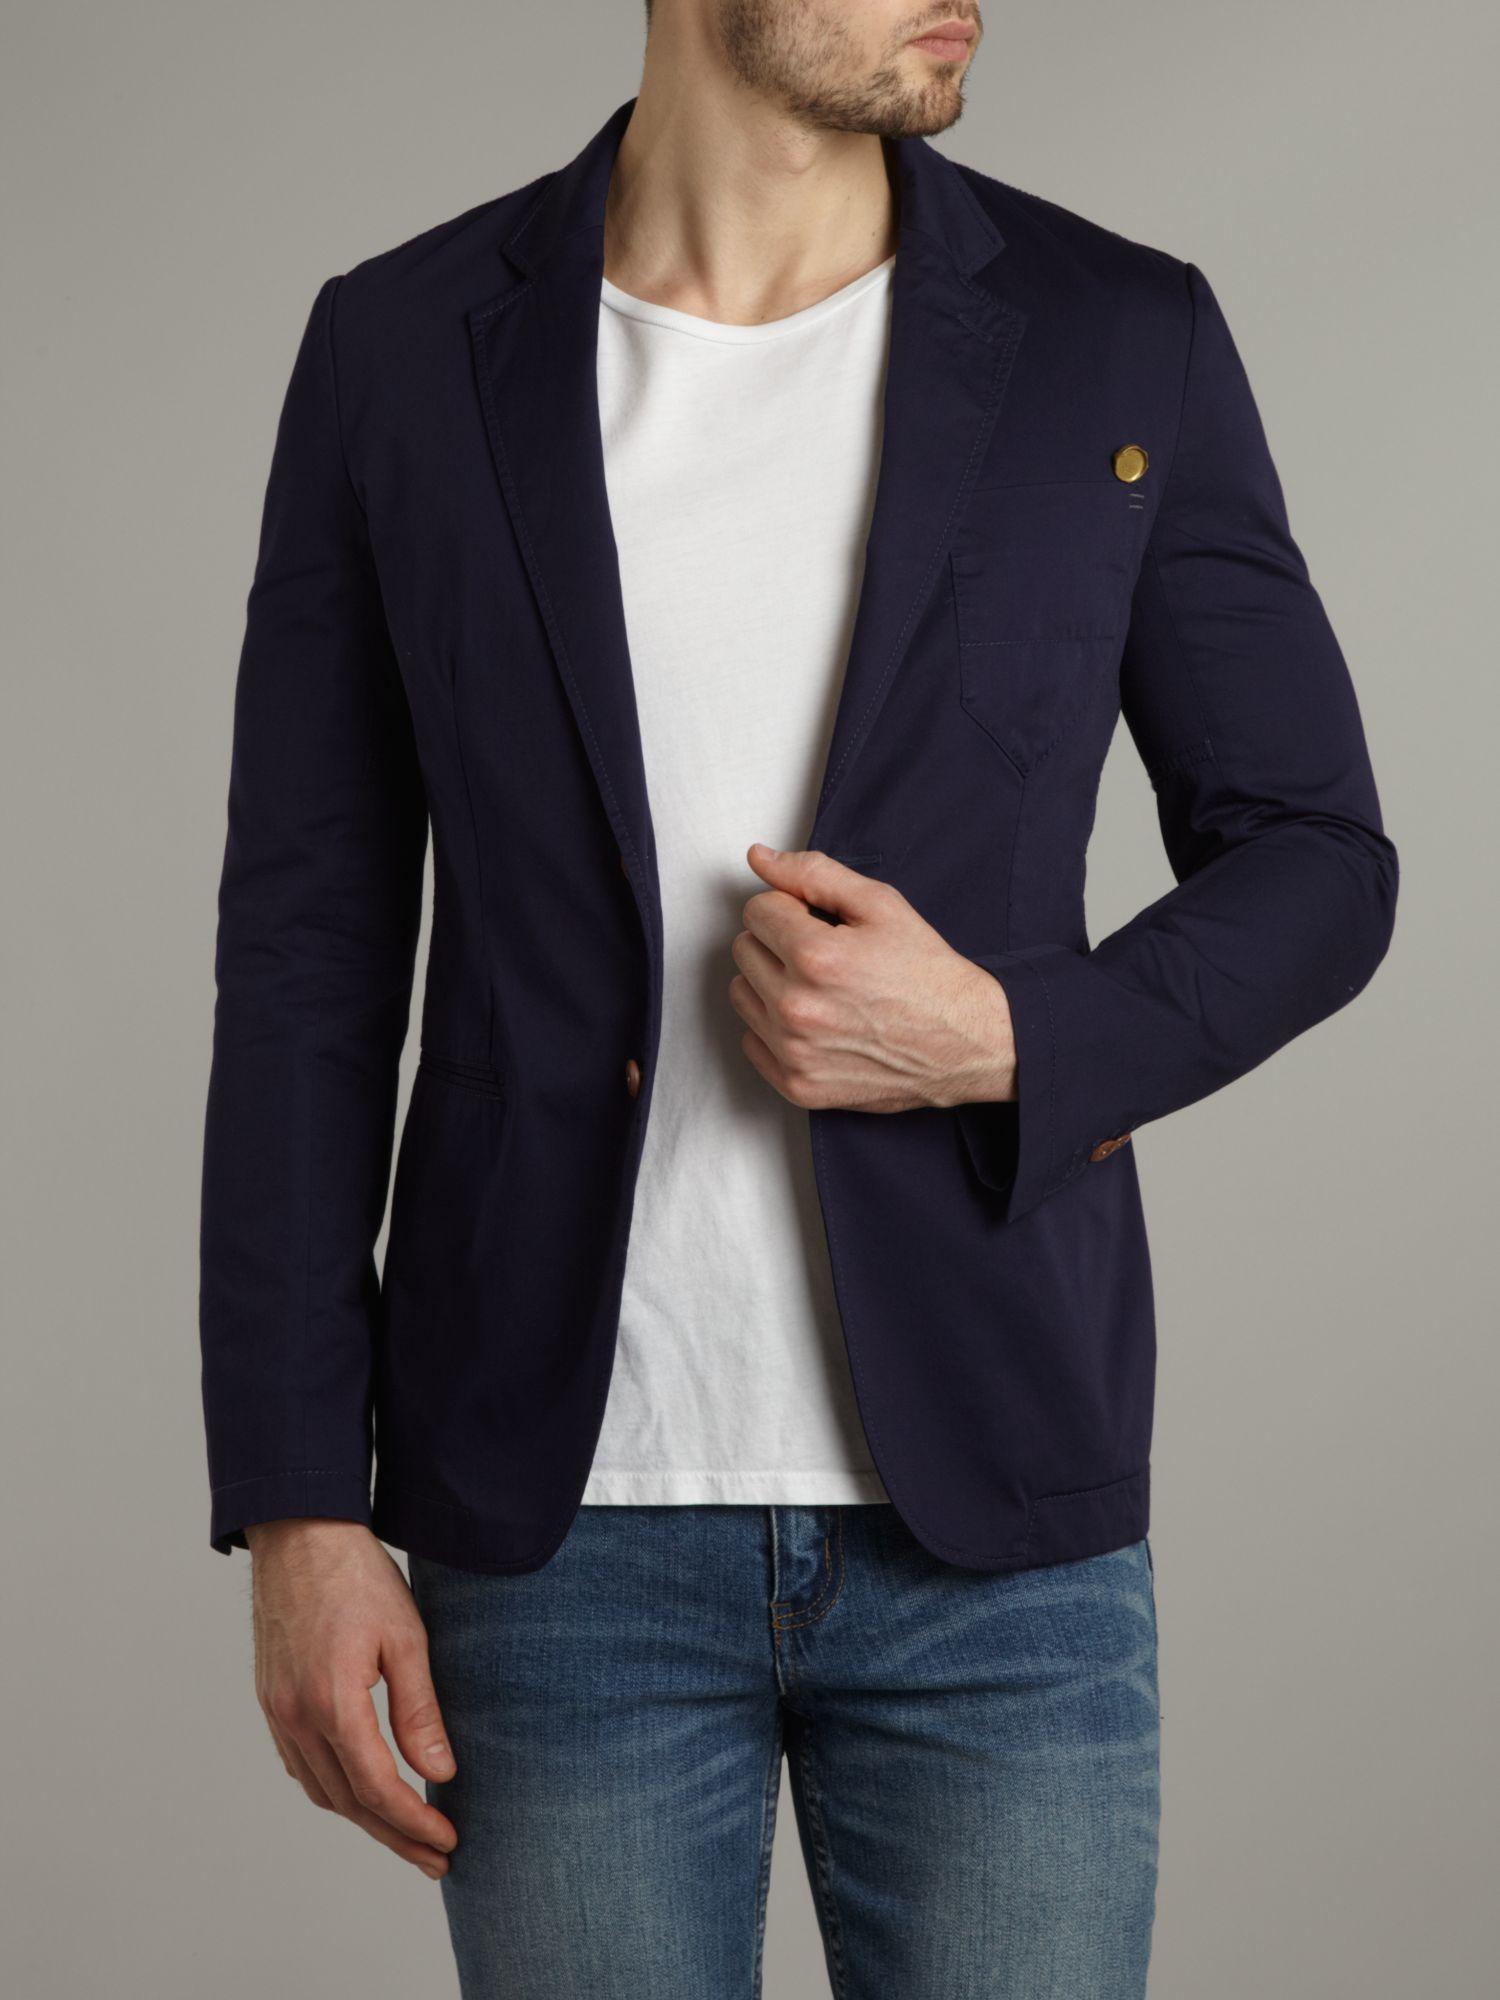 g star raw correct line blazer in blue for men lyst. Black Bedroom Furniture Sets. Home Design Ideas